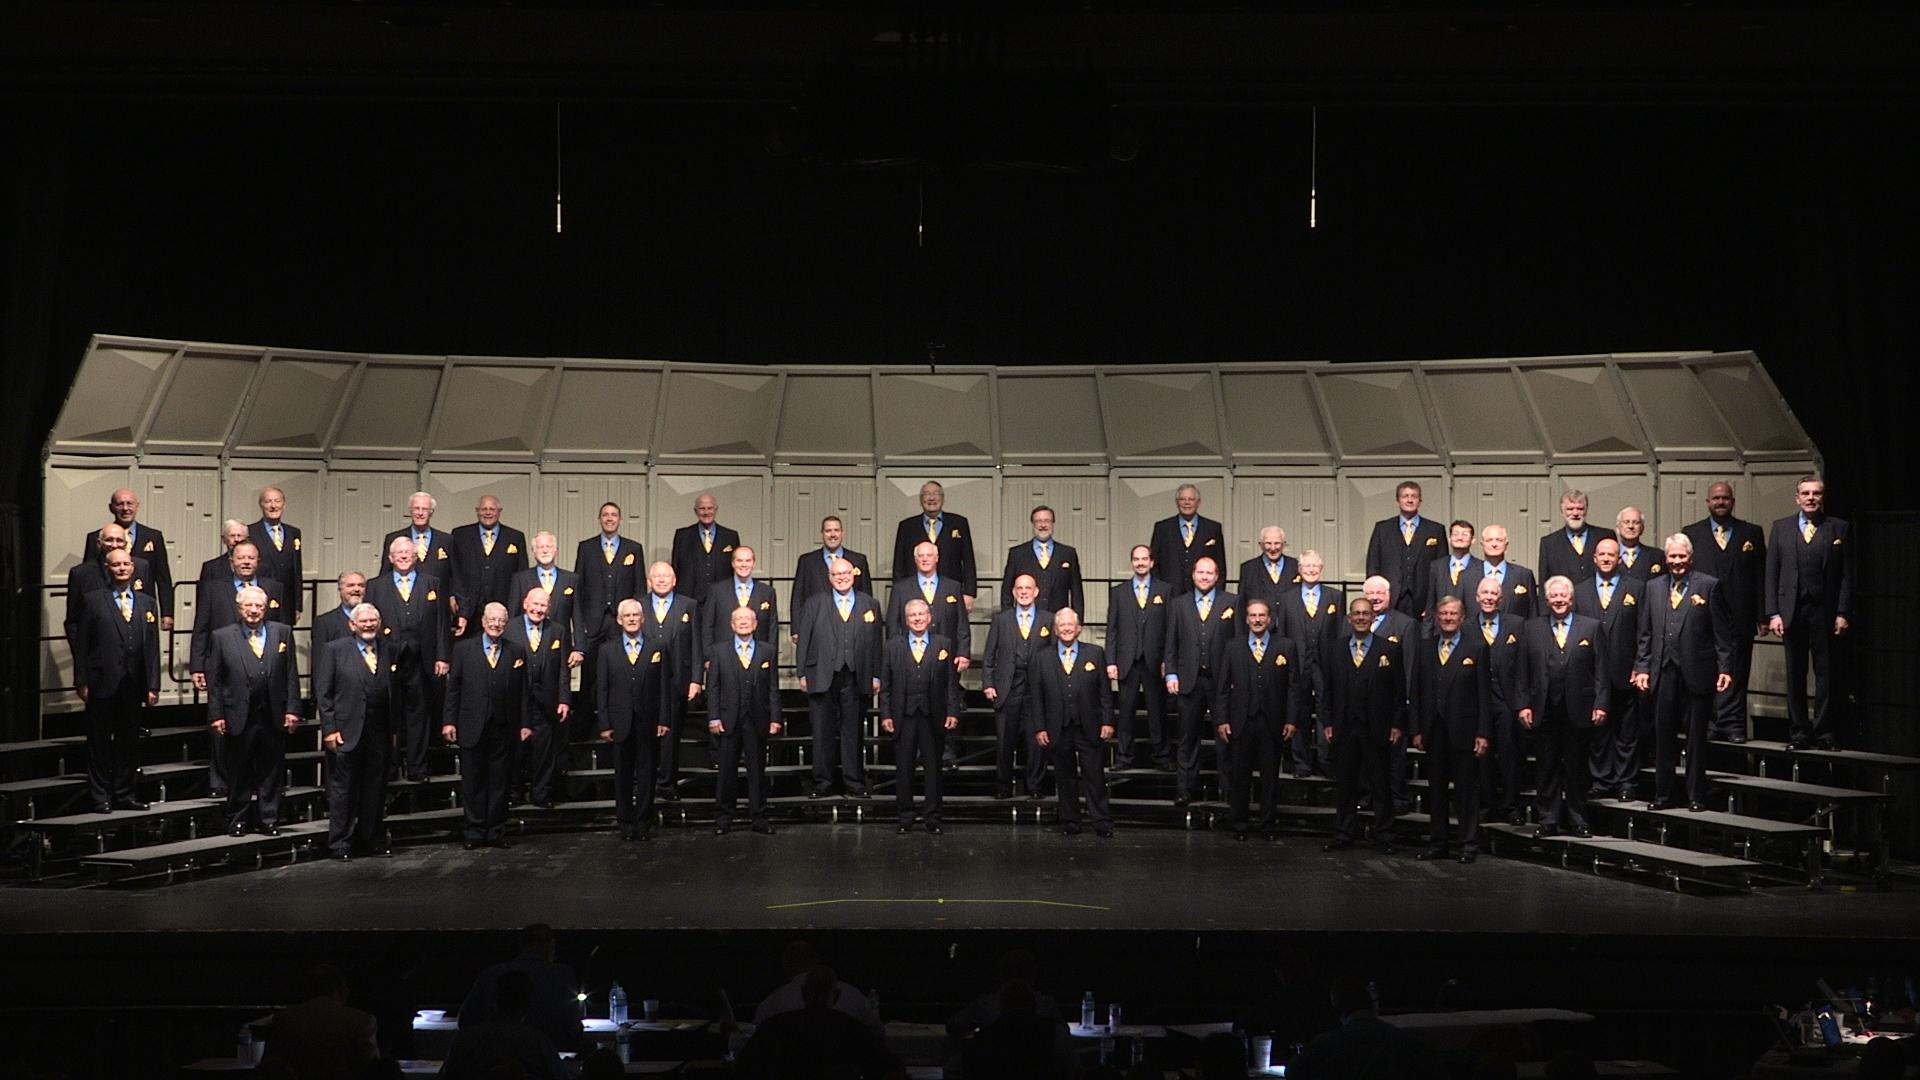 Virginians Barbershop Chorus